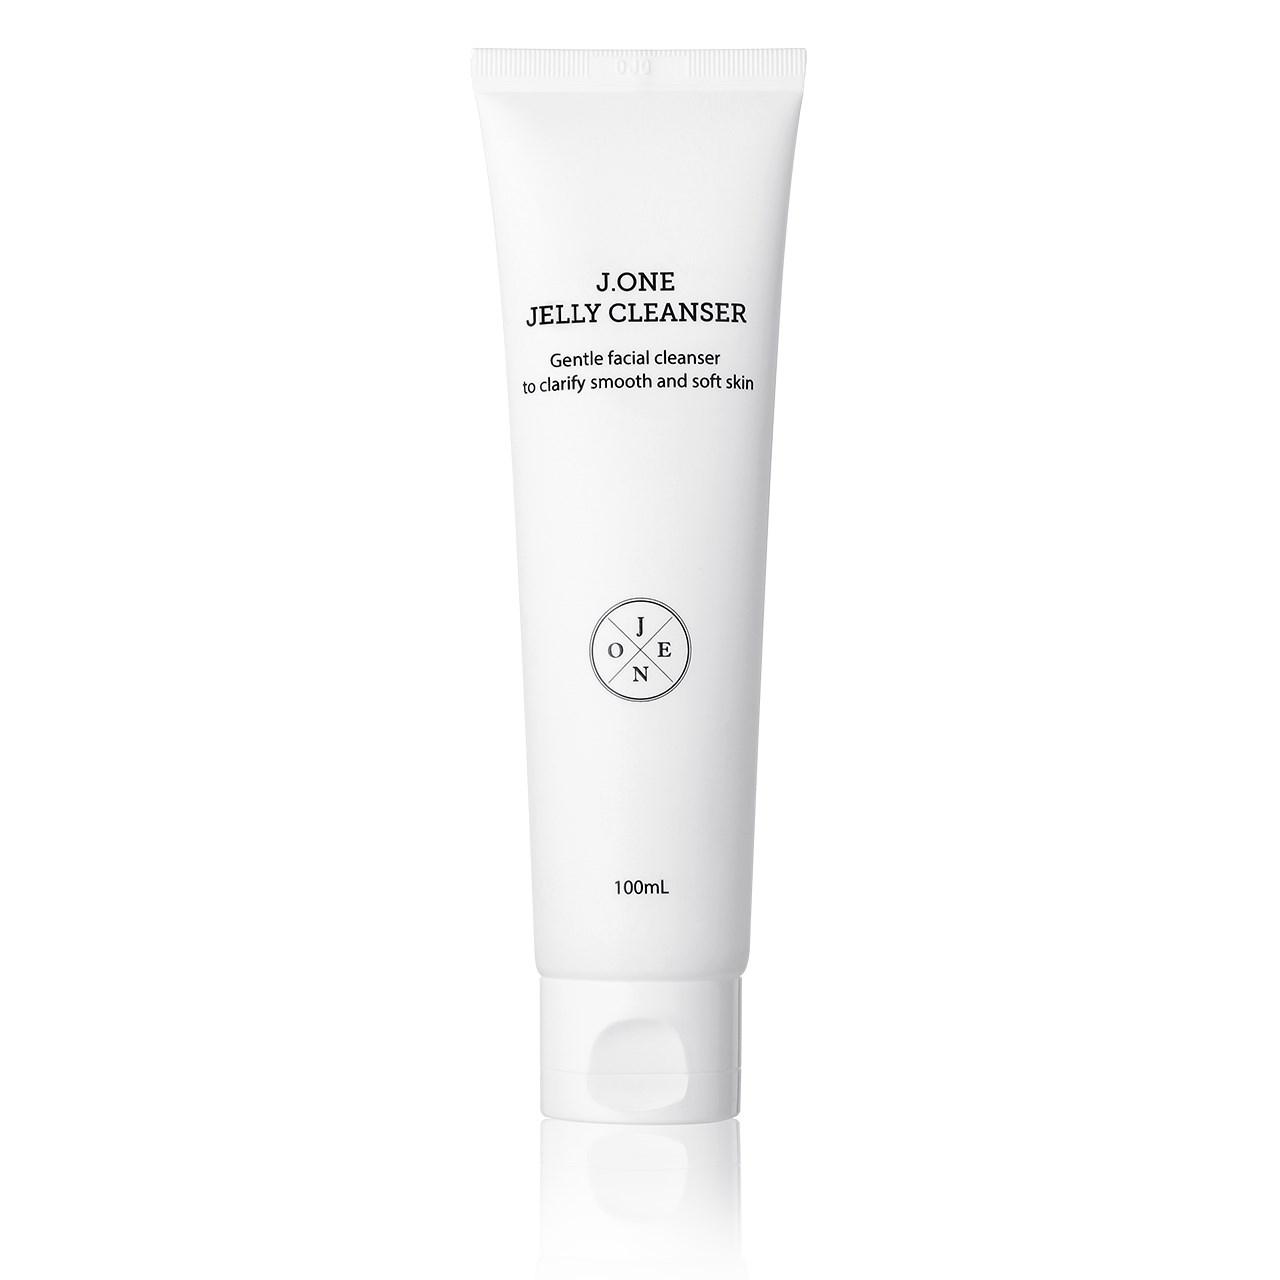 قیمت ژل پاک کننده پوست جی وان مدل jelly cleanser حجم 100 میلی لیتر